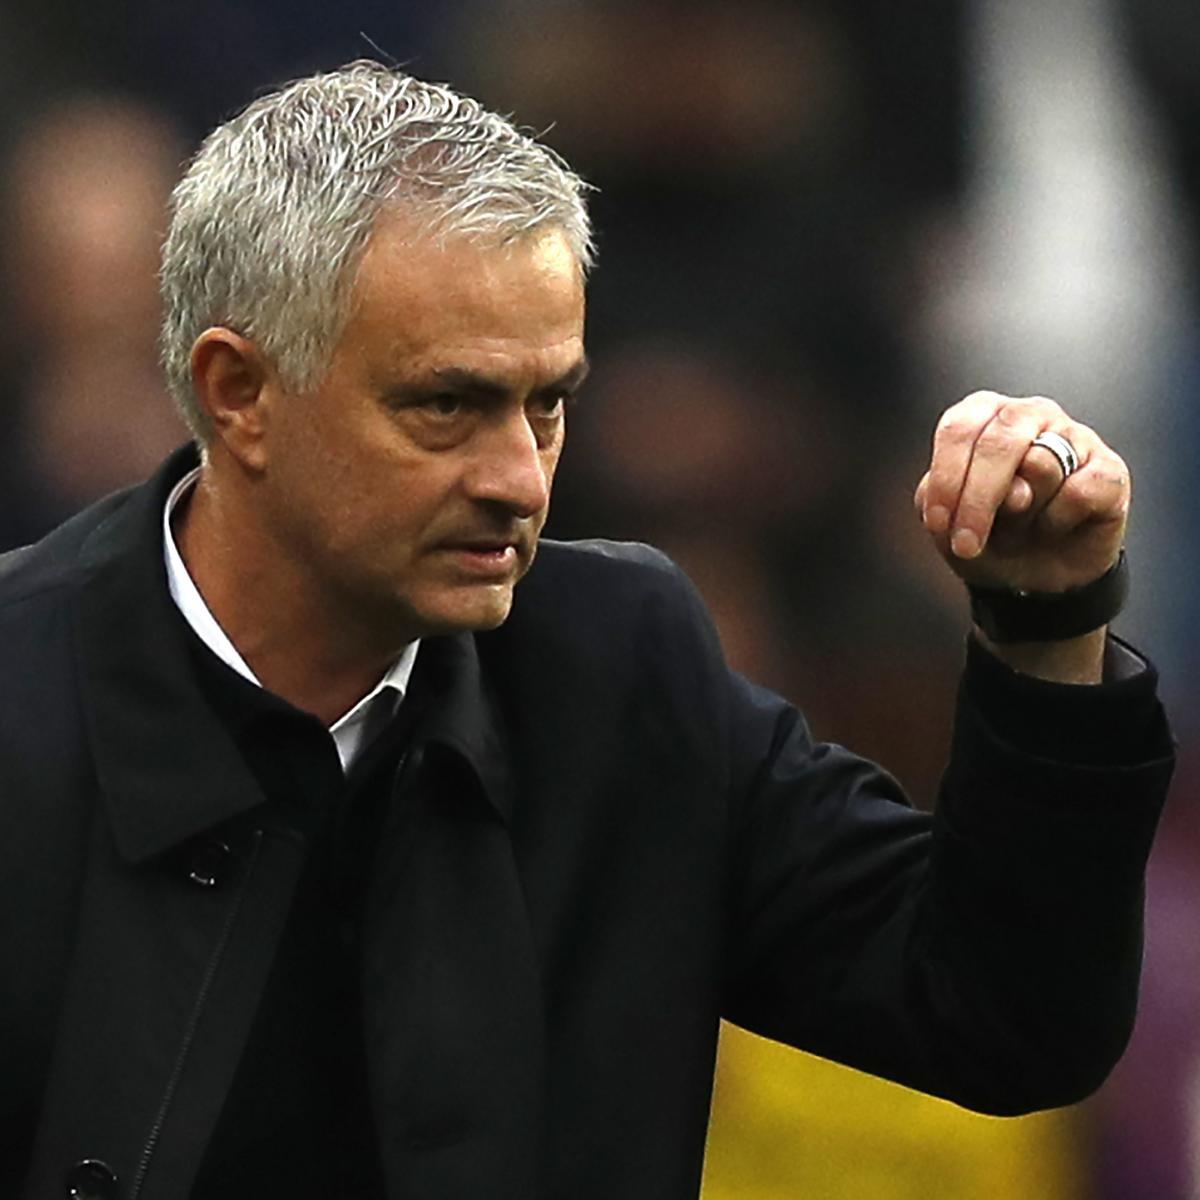 Champions League Qualifiers 2019: Champions League 2019: Odds, Live Stream, TV Schedule